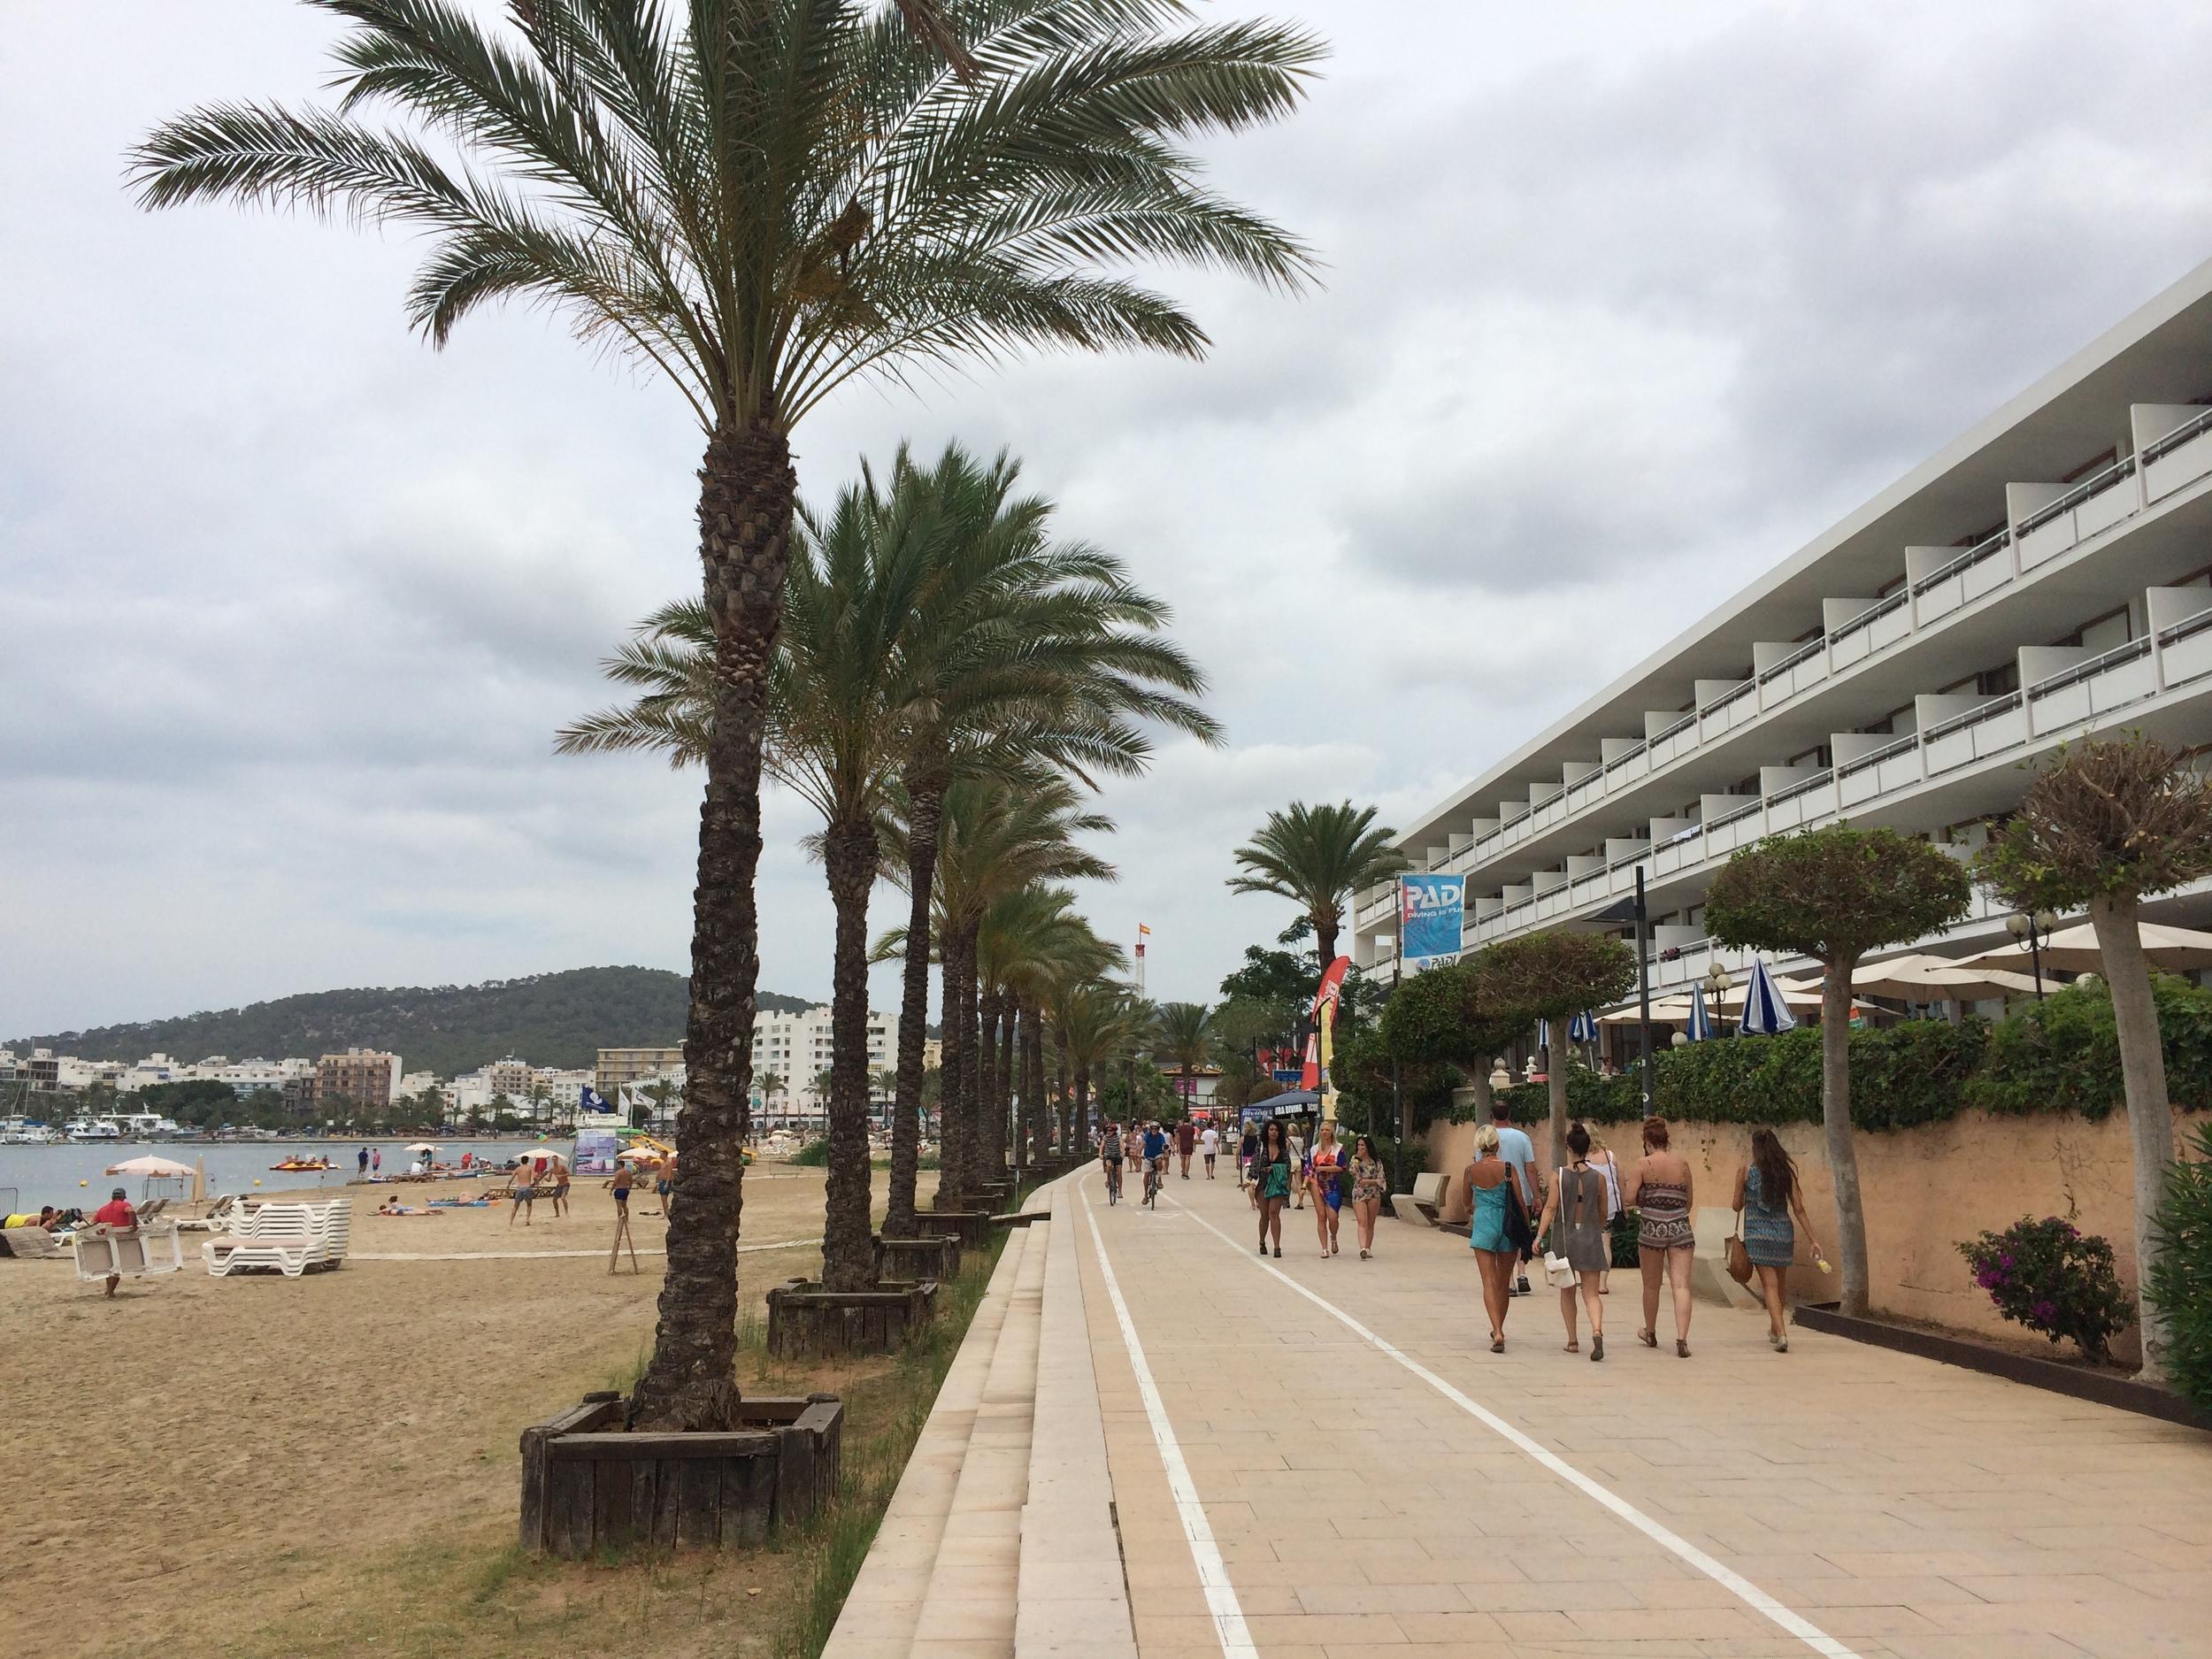 The main thoroughfareof St. Antoni along the beach.